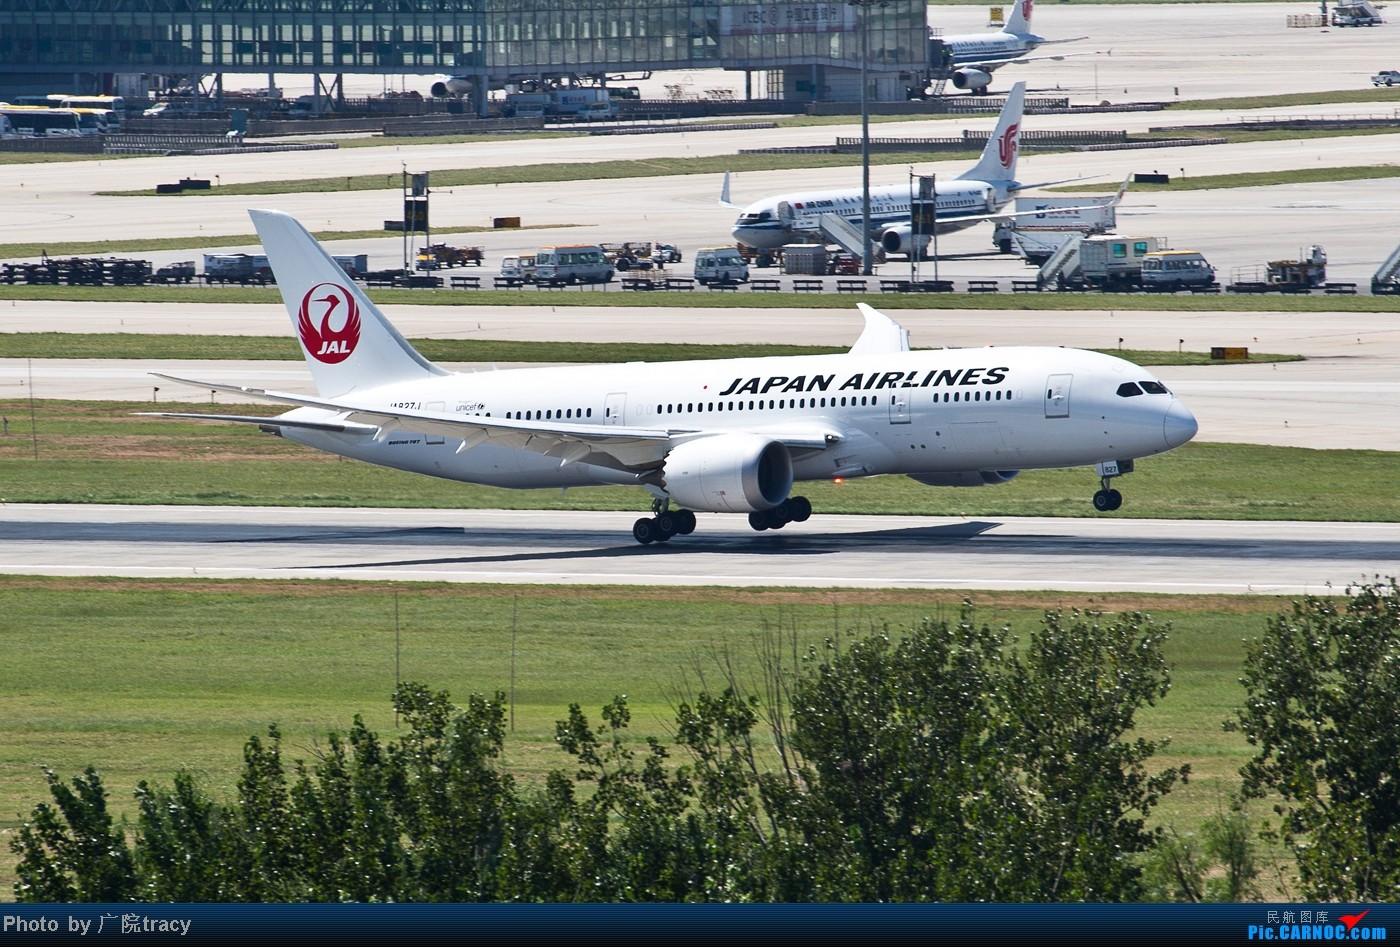 Re:[原创]★ ★ ★ ★ ★目前已经拍到了9家航空公司的波音787梦想客机★ ★ ★ ★ ★ BOEING 787-8 JA827J 中国北京首都机场